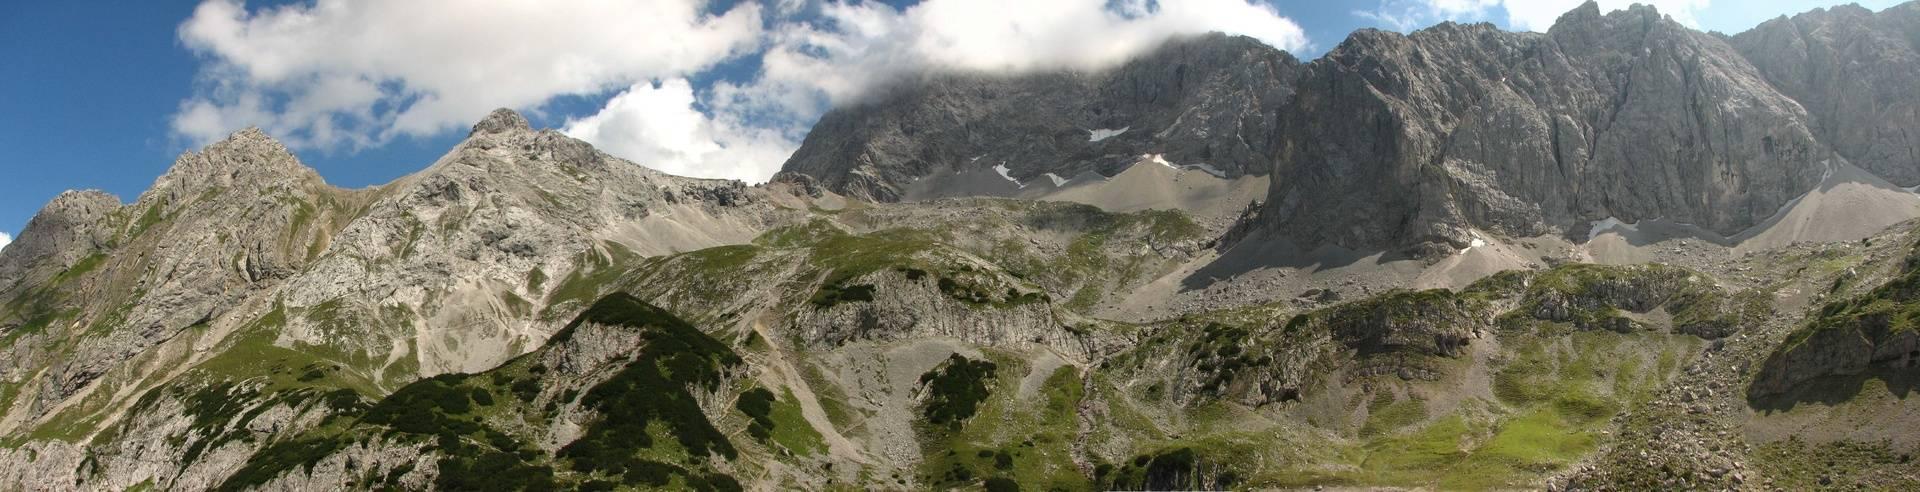 Above Drachensee